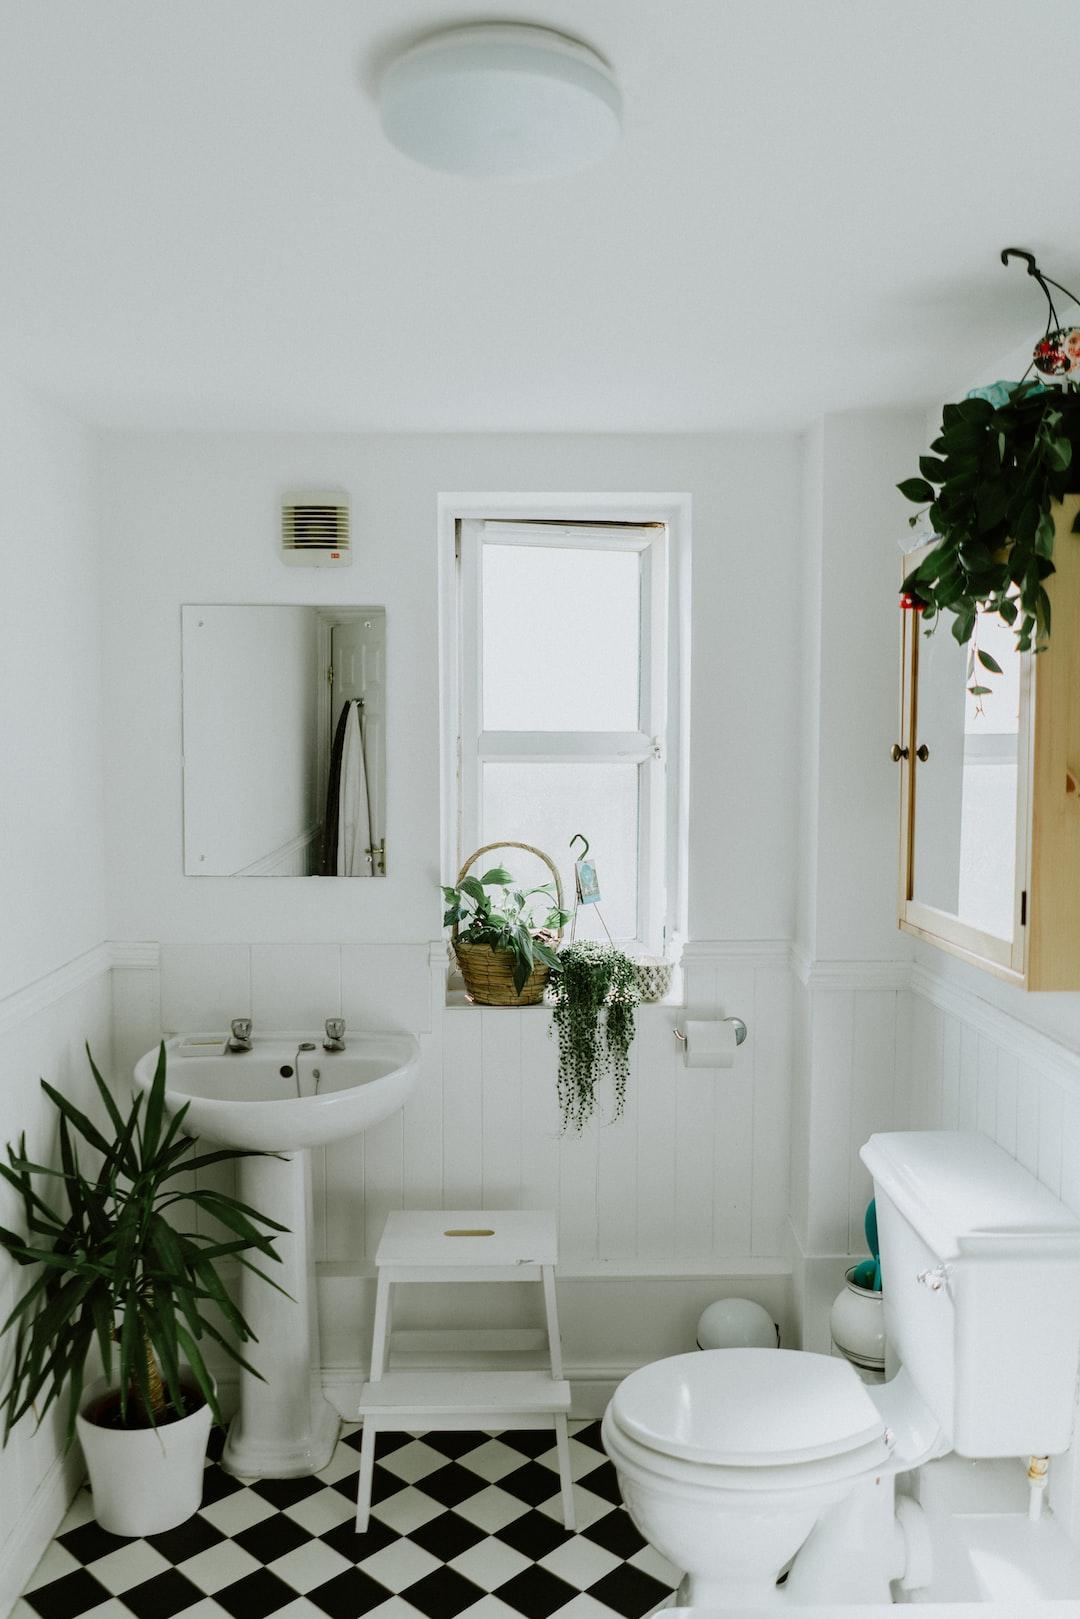 The Best Kept Secrets About A Full Bathroom Remodel